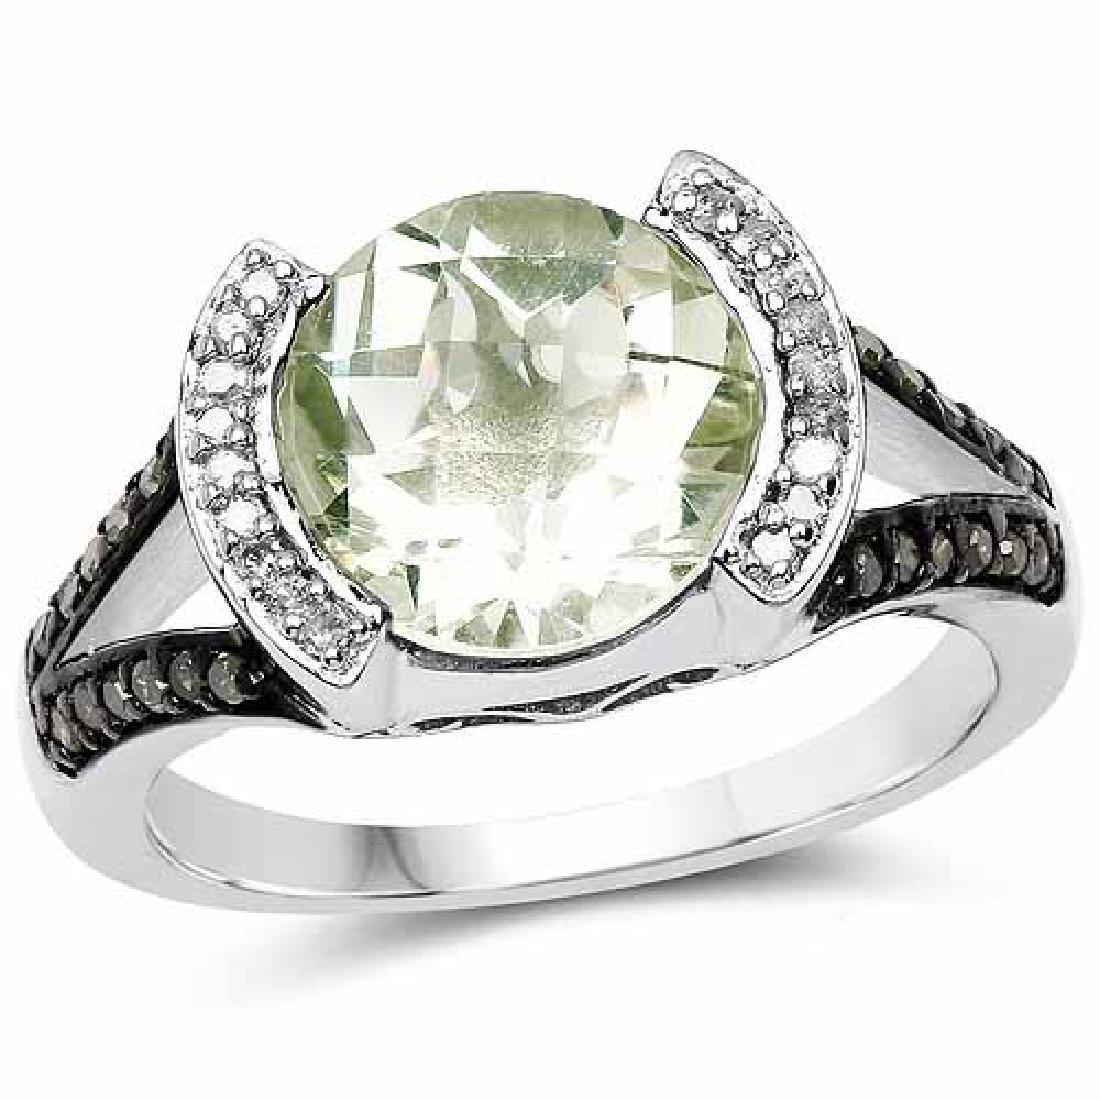 3.59 Carat Genuine Green Amethyst Green Diamond and W